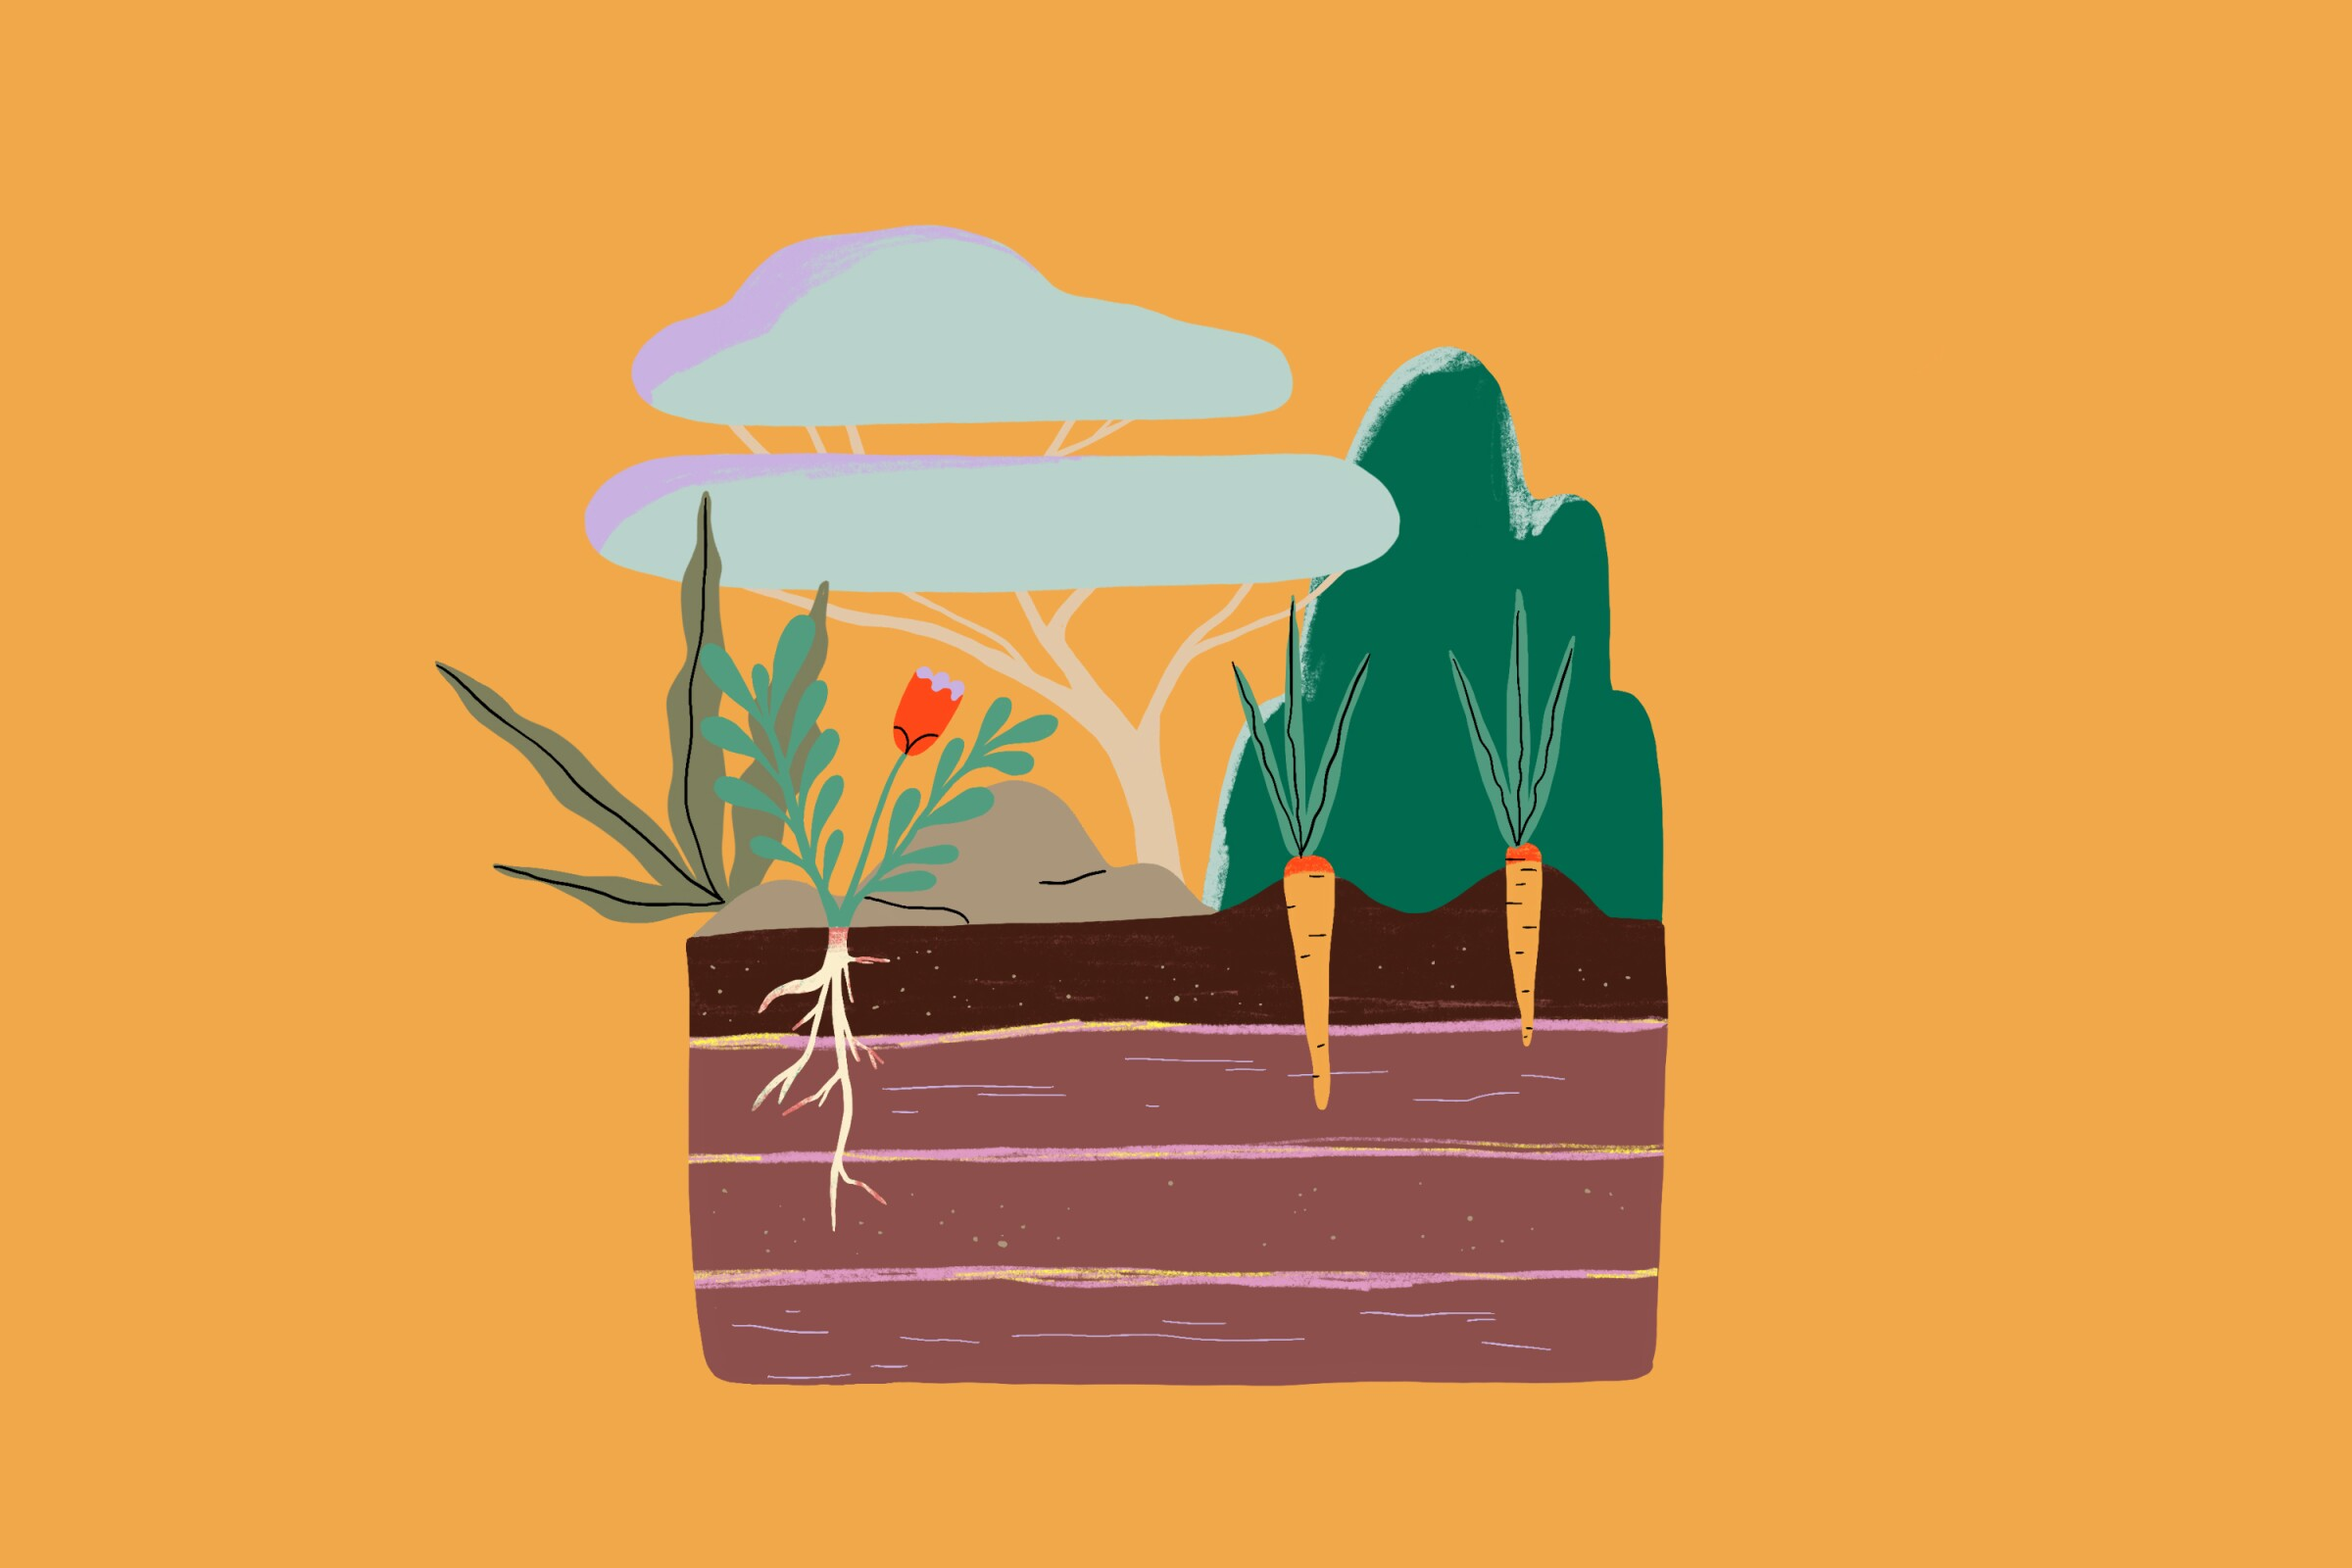 Mulch illustration